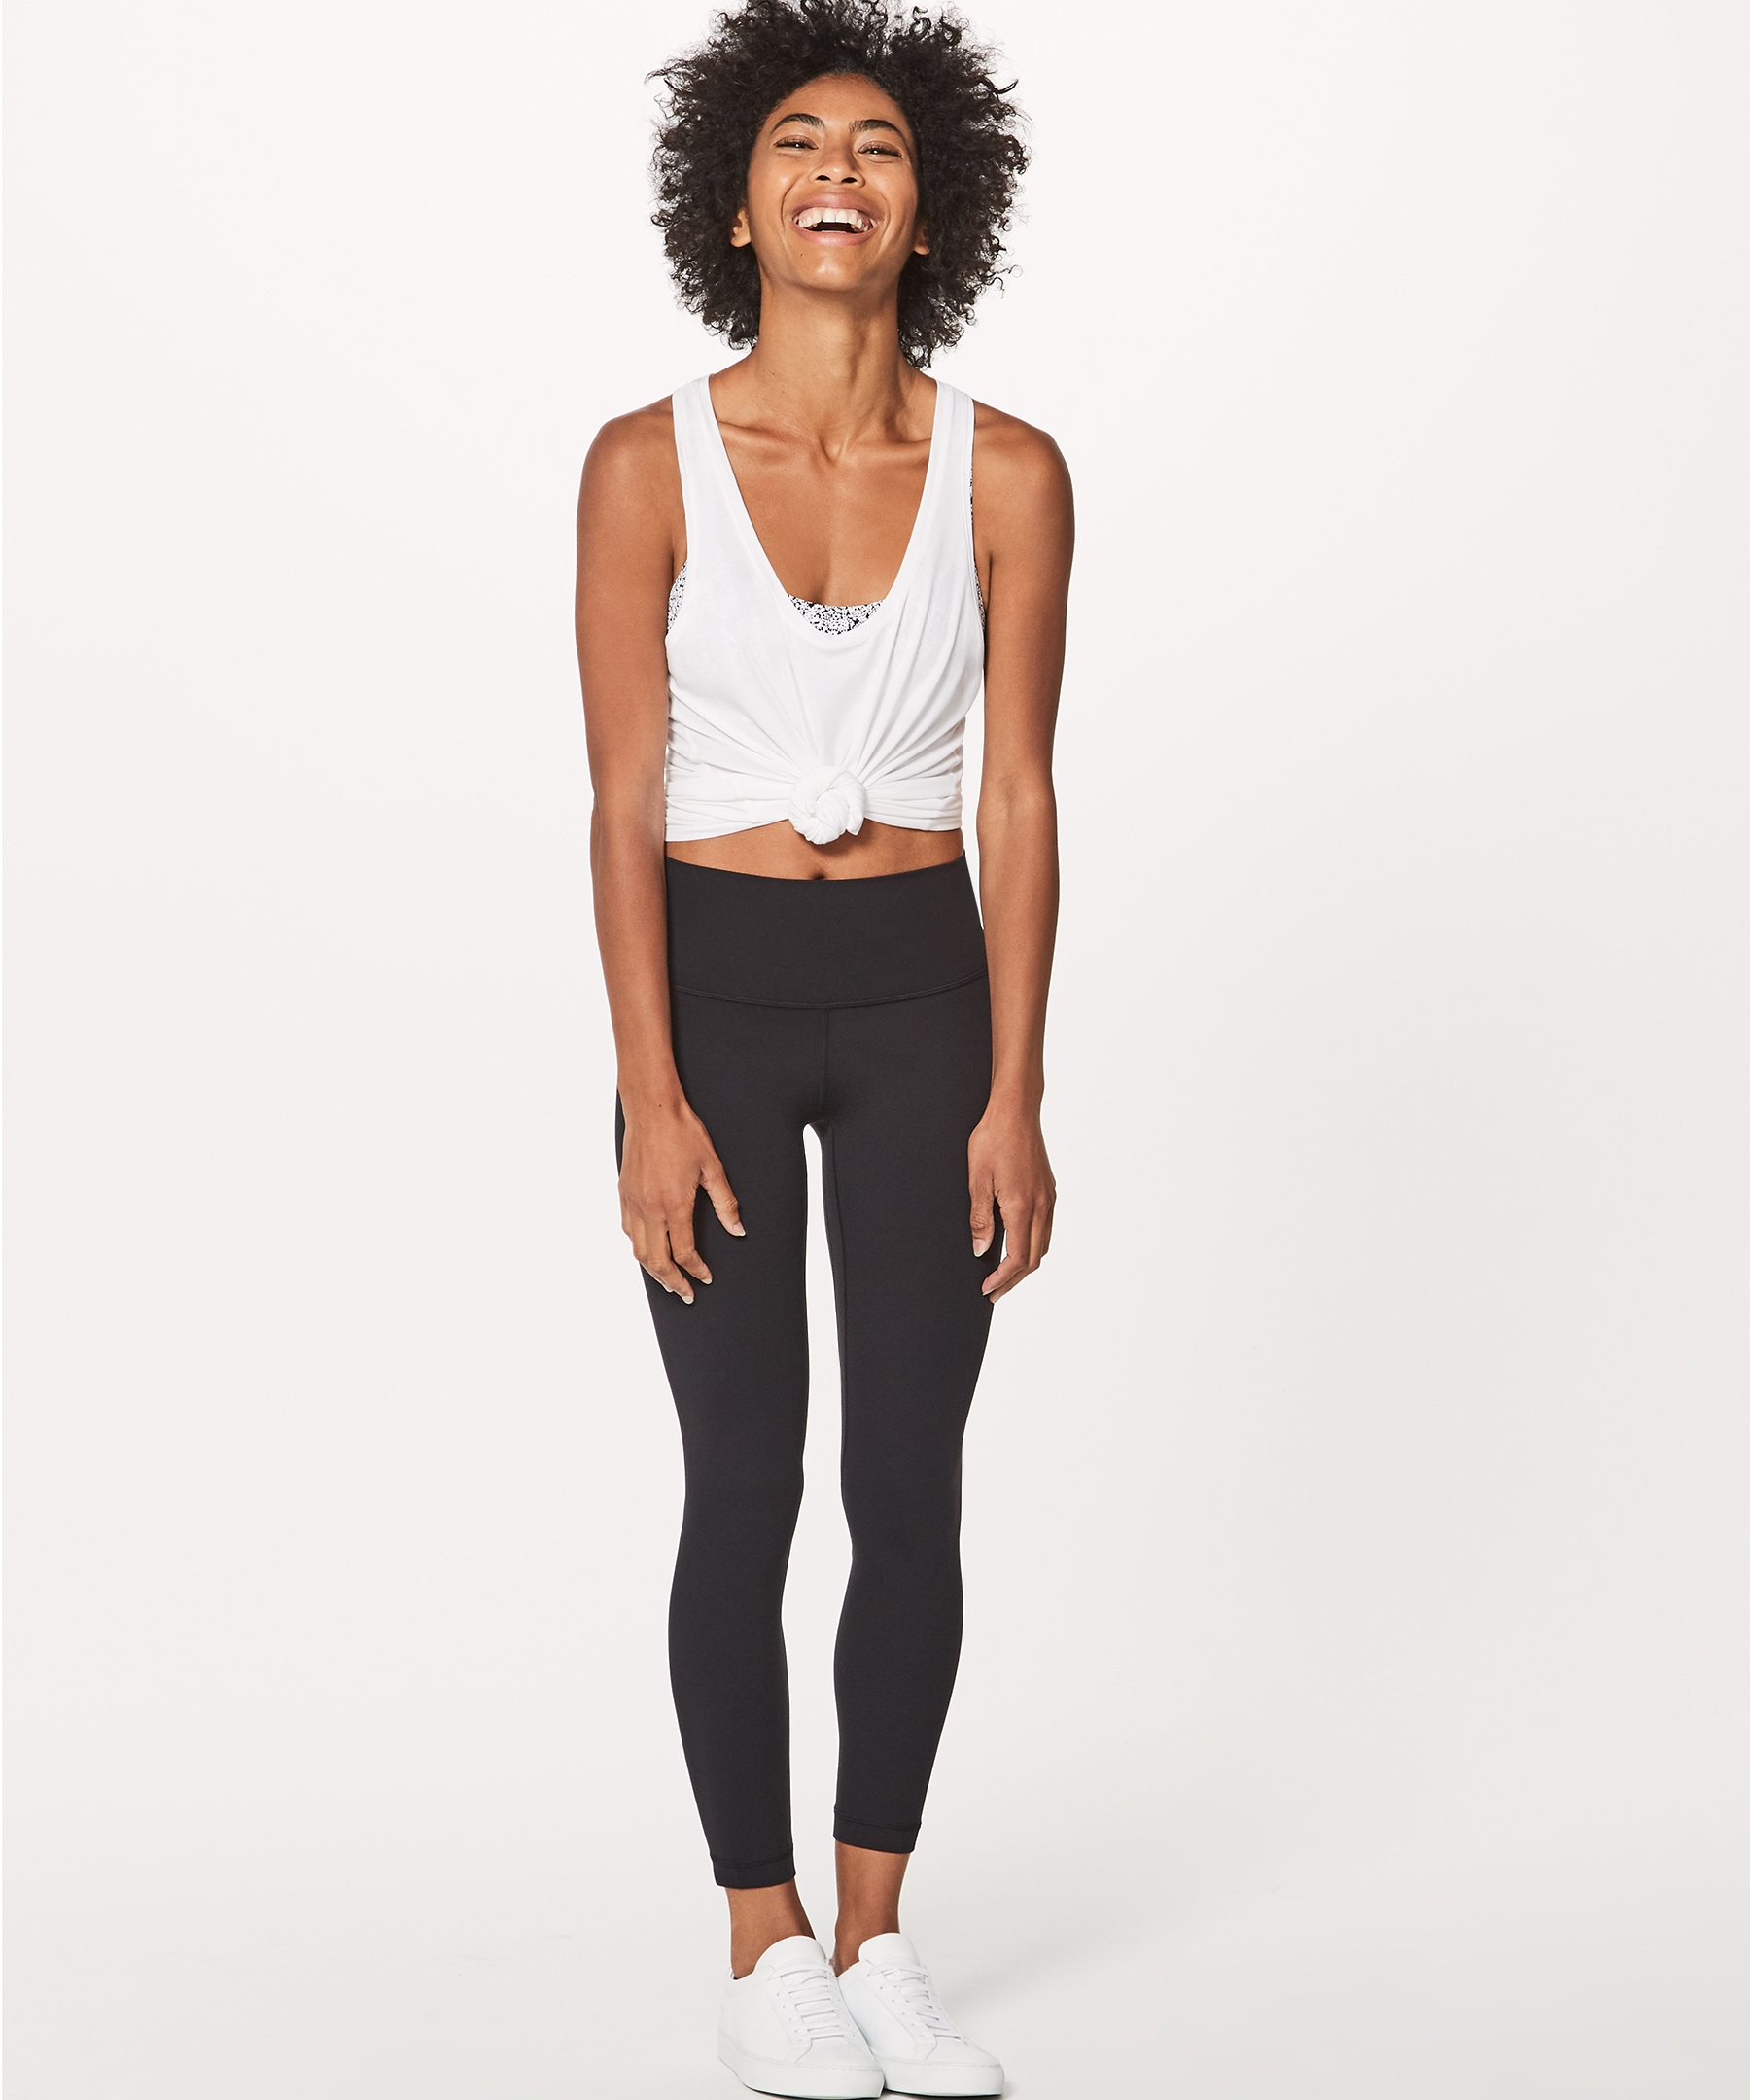 Align Pant Ii 25 Women S Yoga Pants Lululemon Yoga Pants Lululemon Yoga Pants Women Lululemon Align Pant